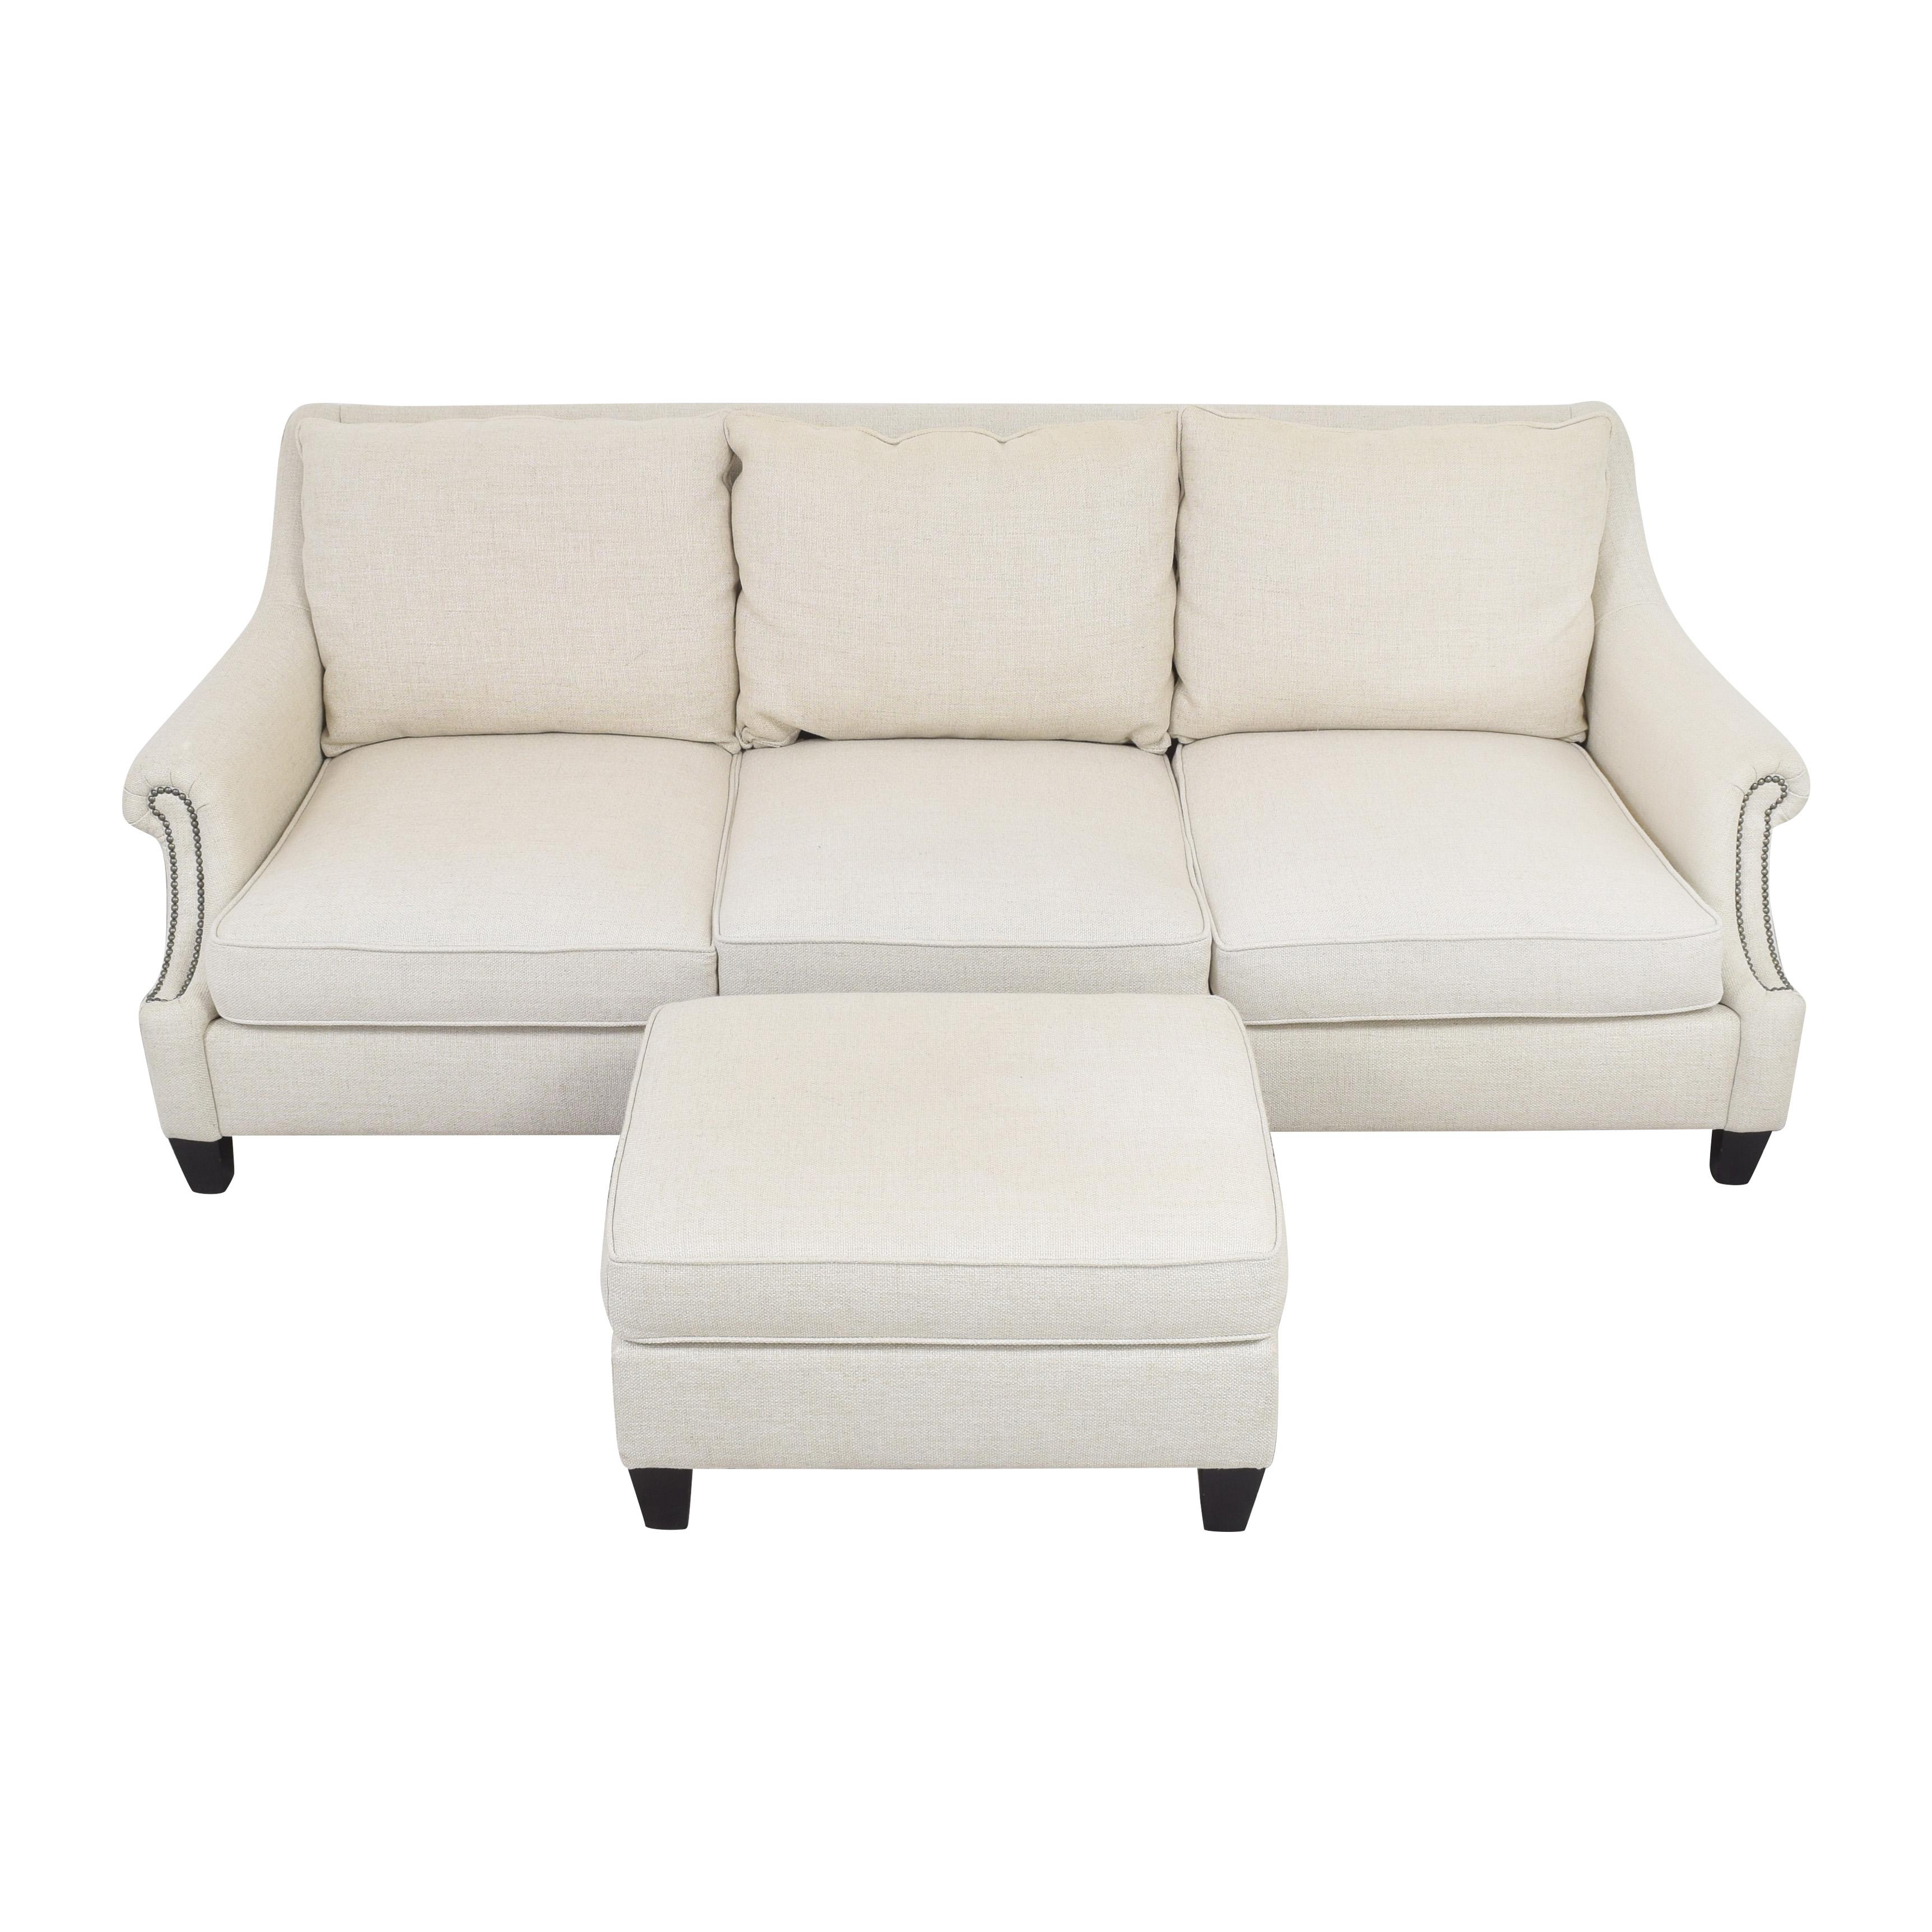 buy Raymour & Flanigan Three Cushion Sofa with Ottoman Raymour & Flanigan Sofas